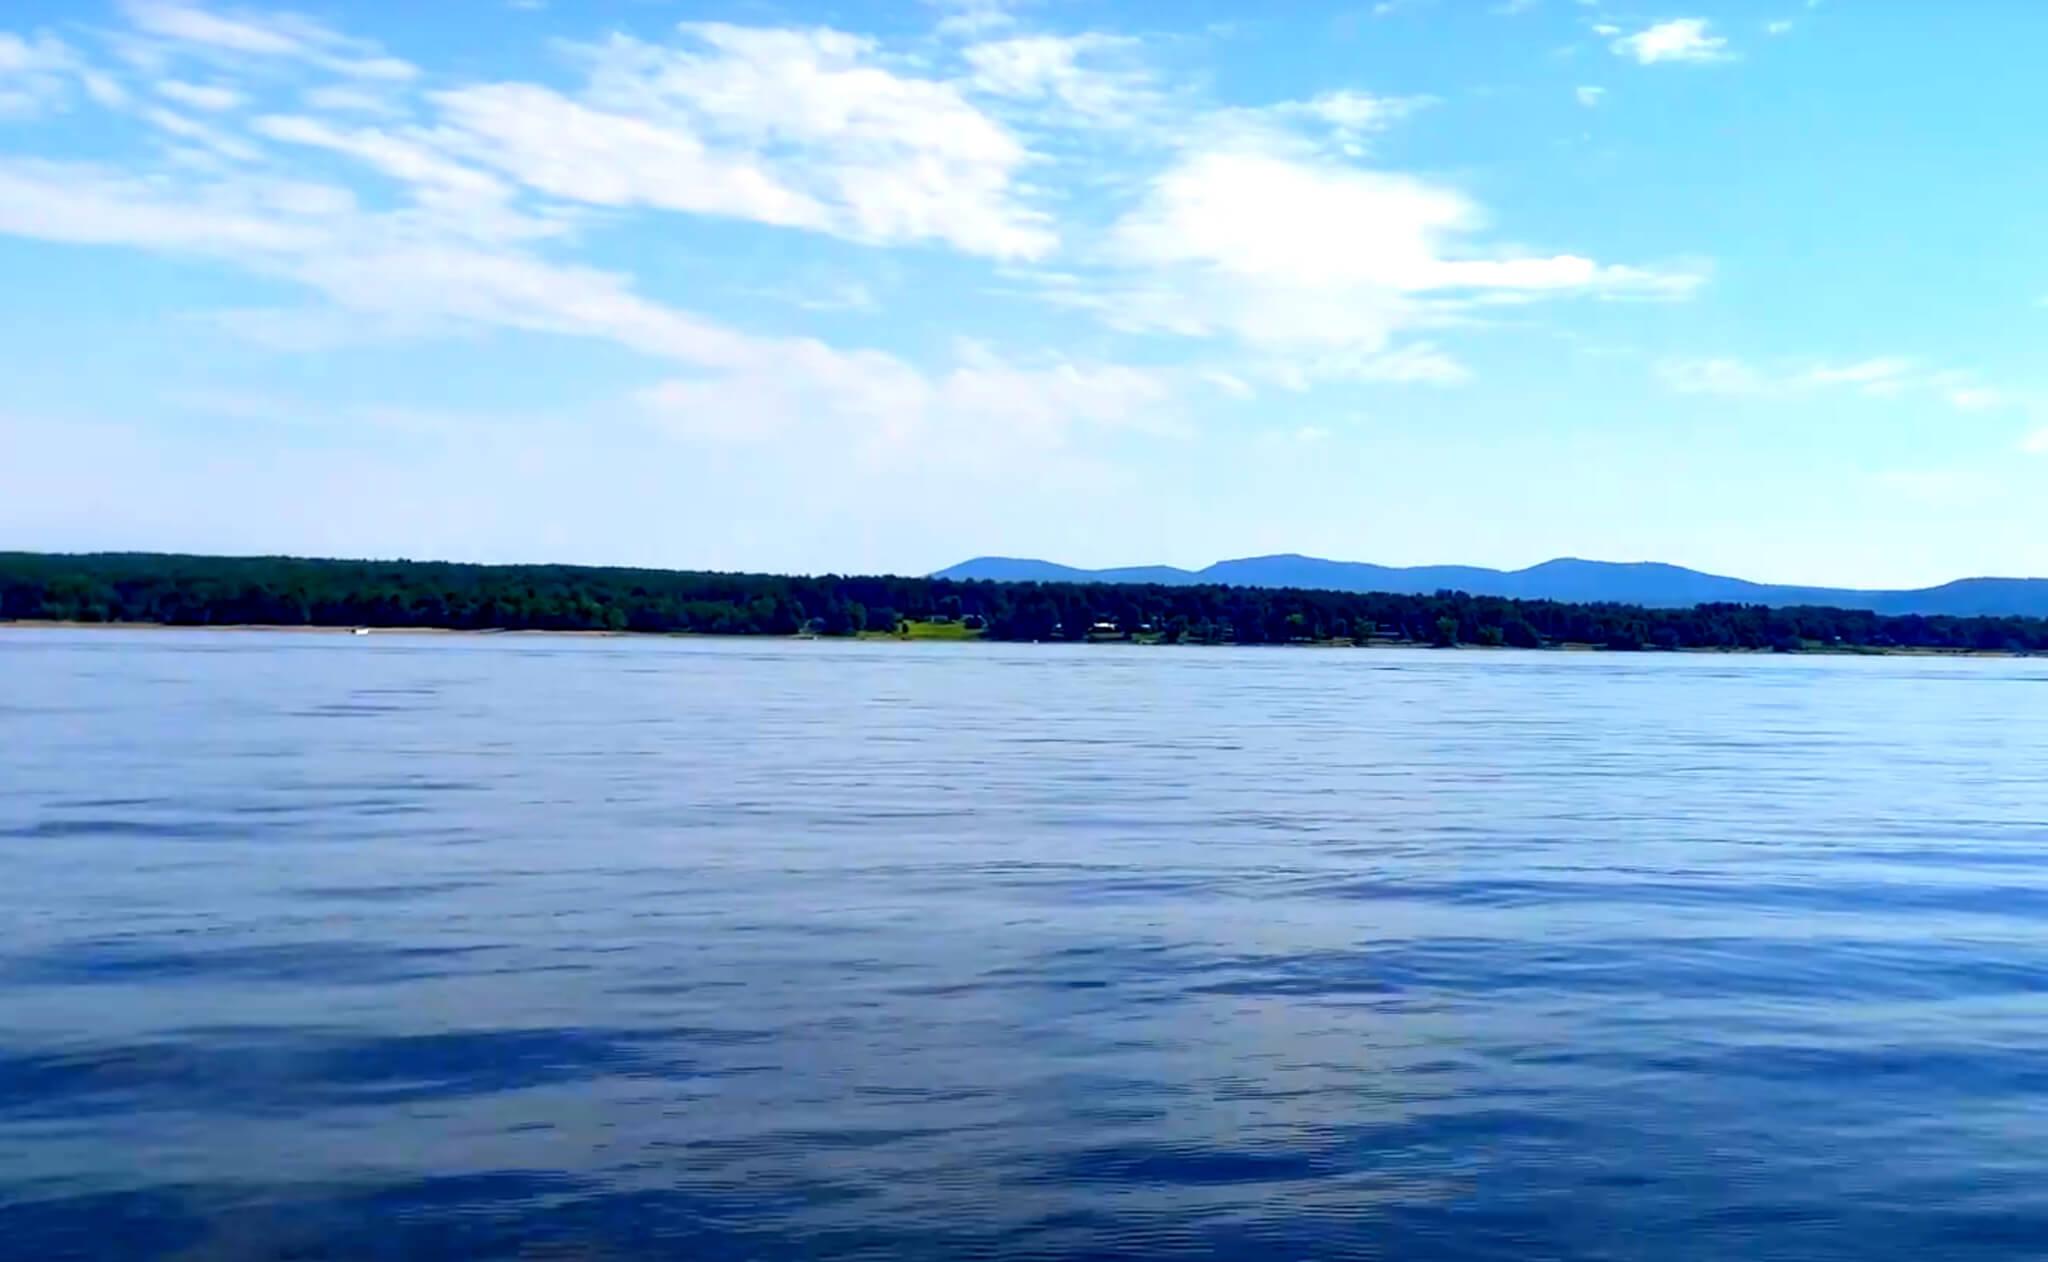 Great-Sacandaga-Lake-Fishing-Report-Guide-New-York-NY-01